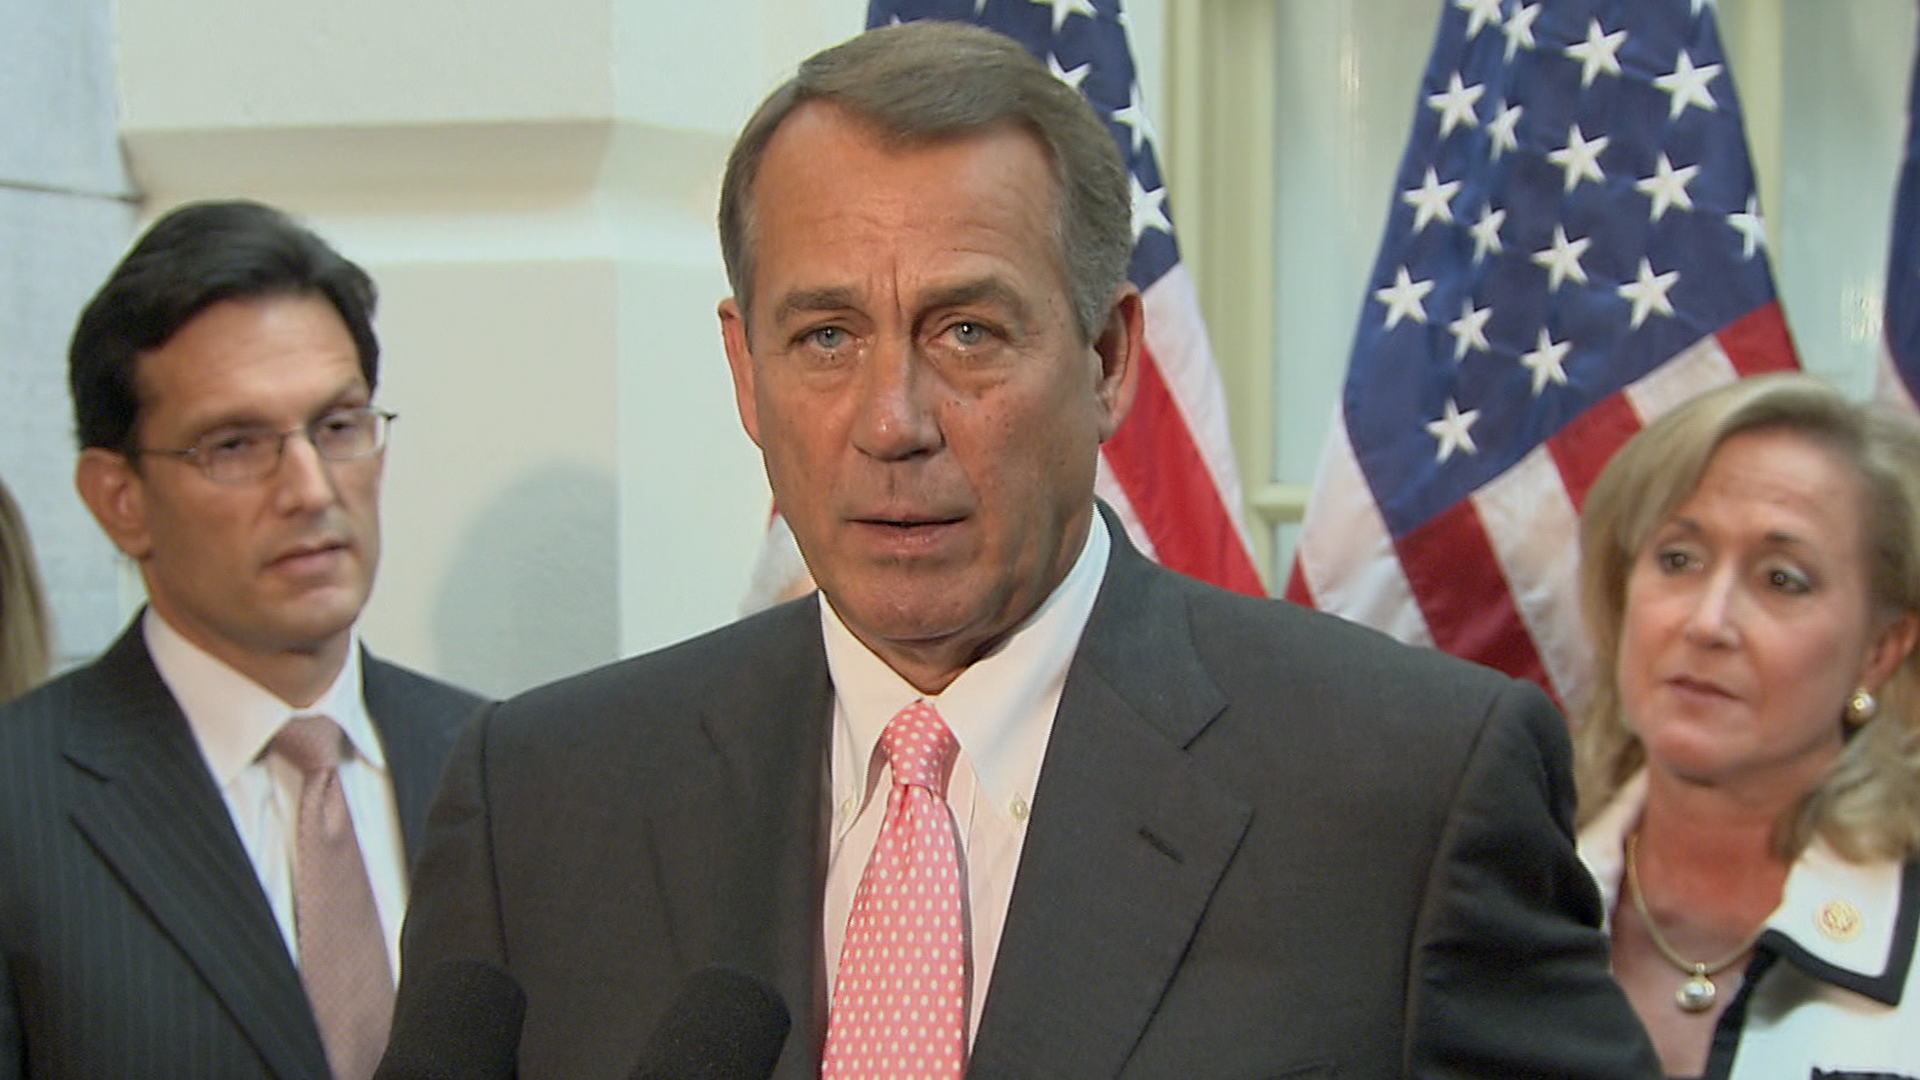 GOP pivots to hypocrisy on jobs